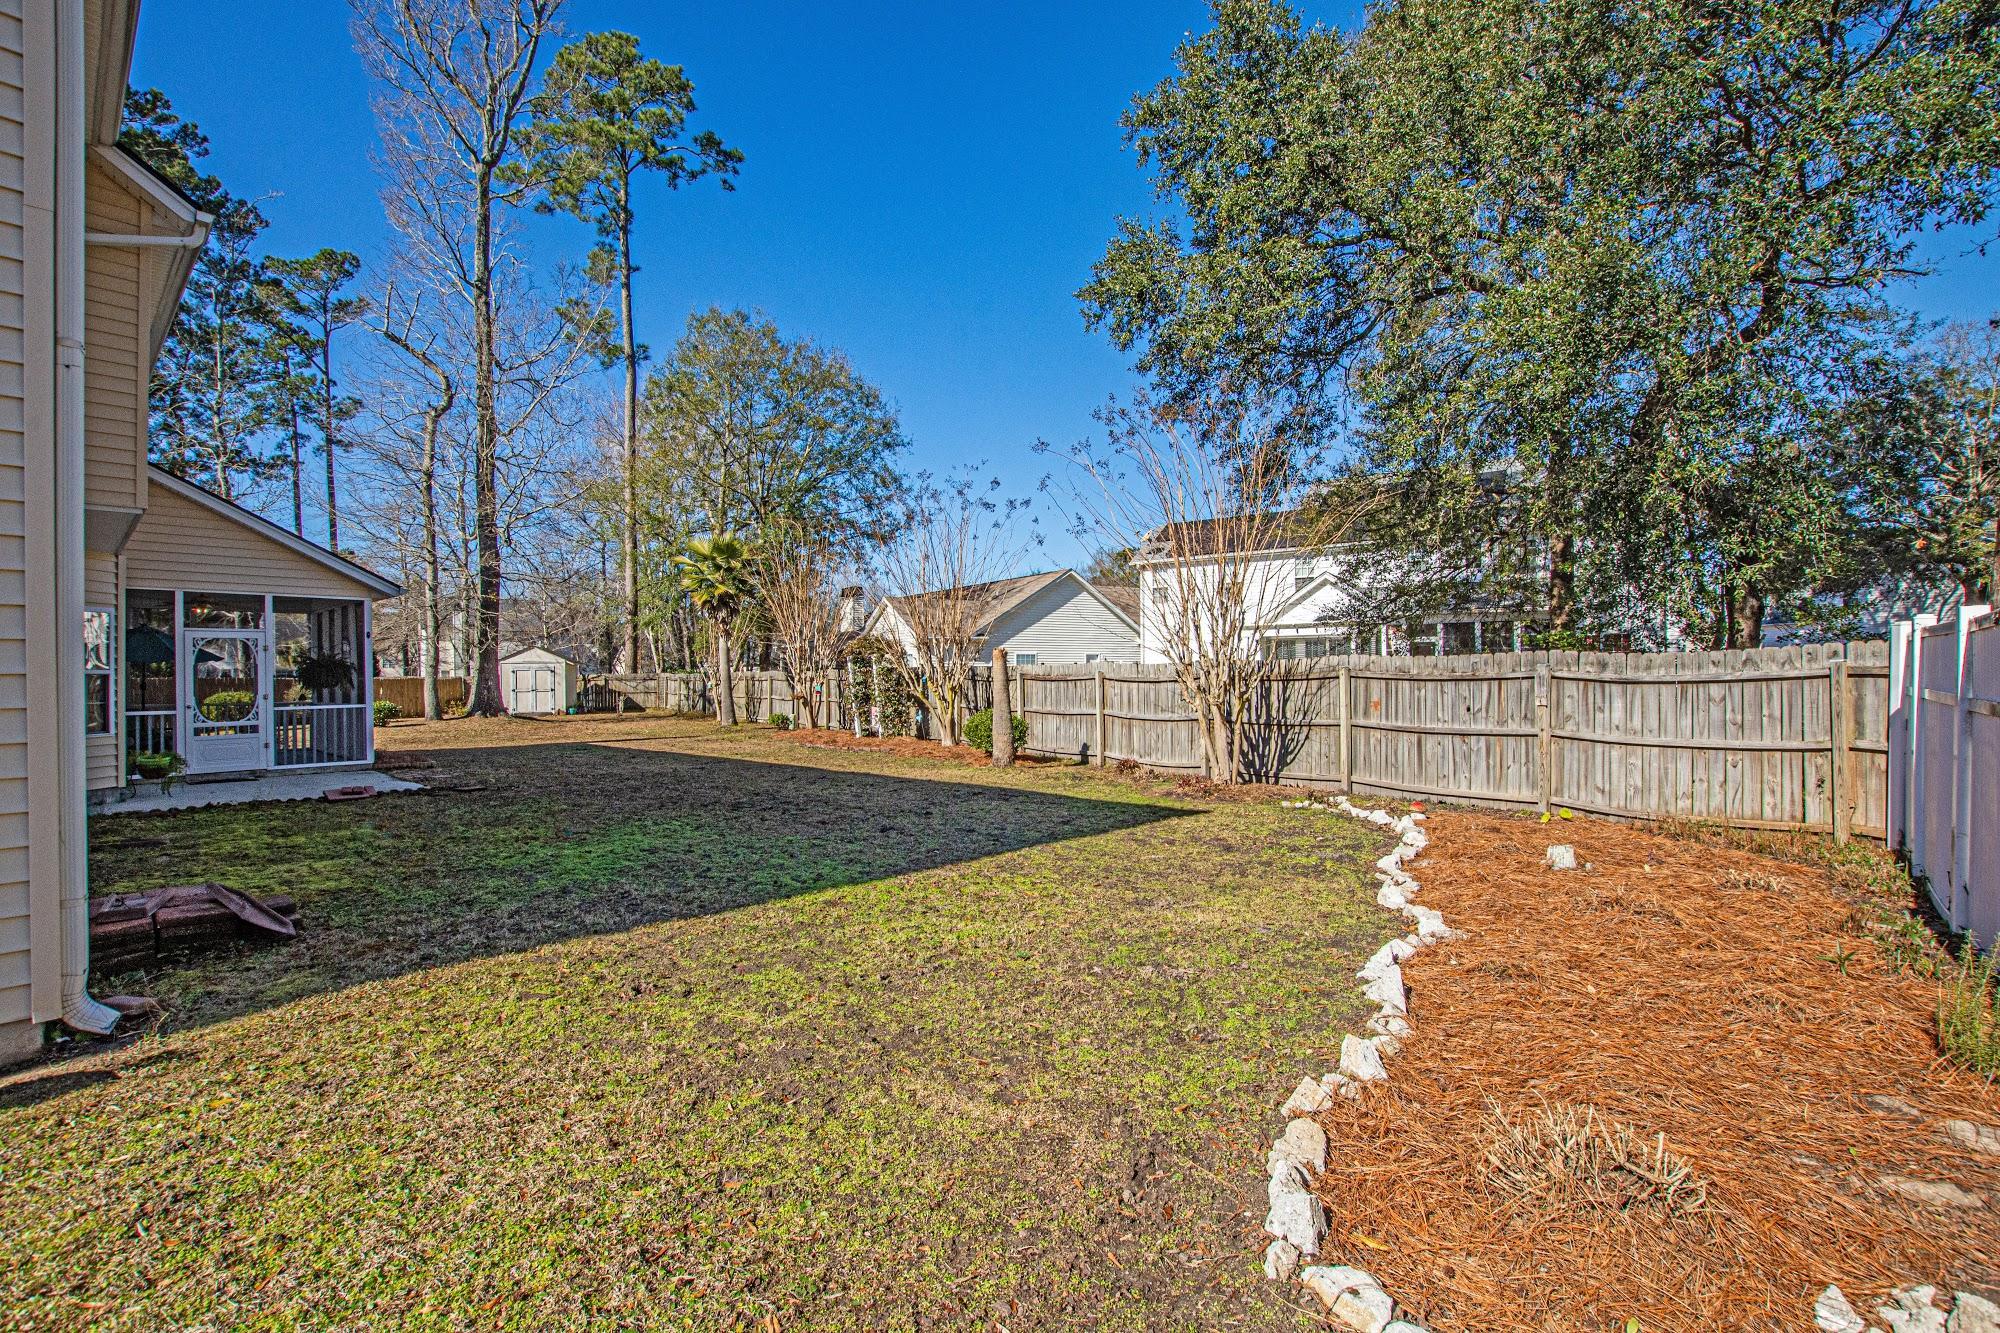 Indigo Fields Homes For Sale - 5512 Rowsham, North Charleston, SC - 3